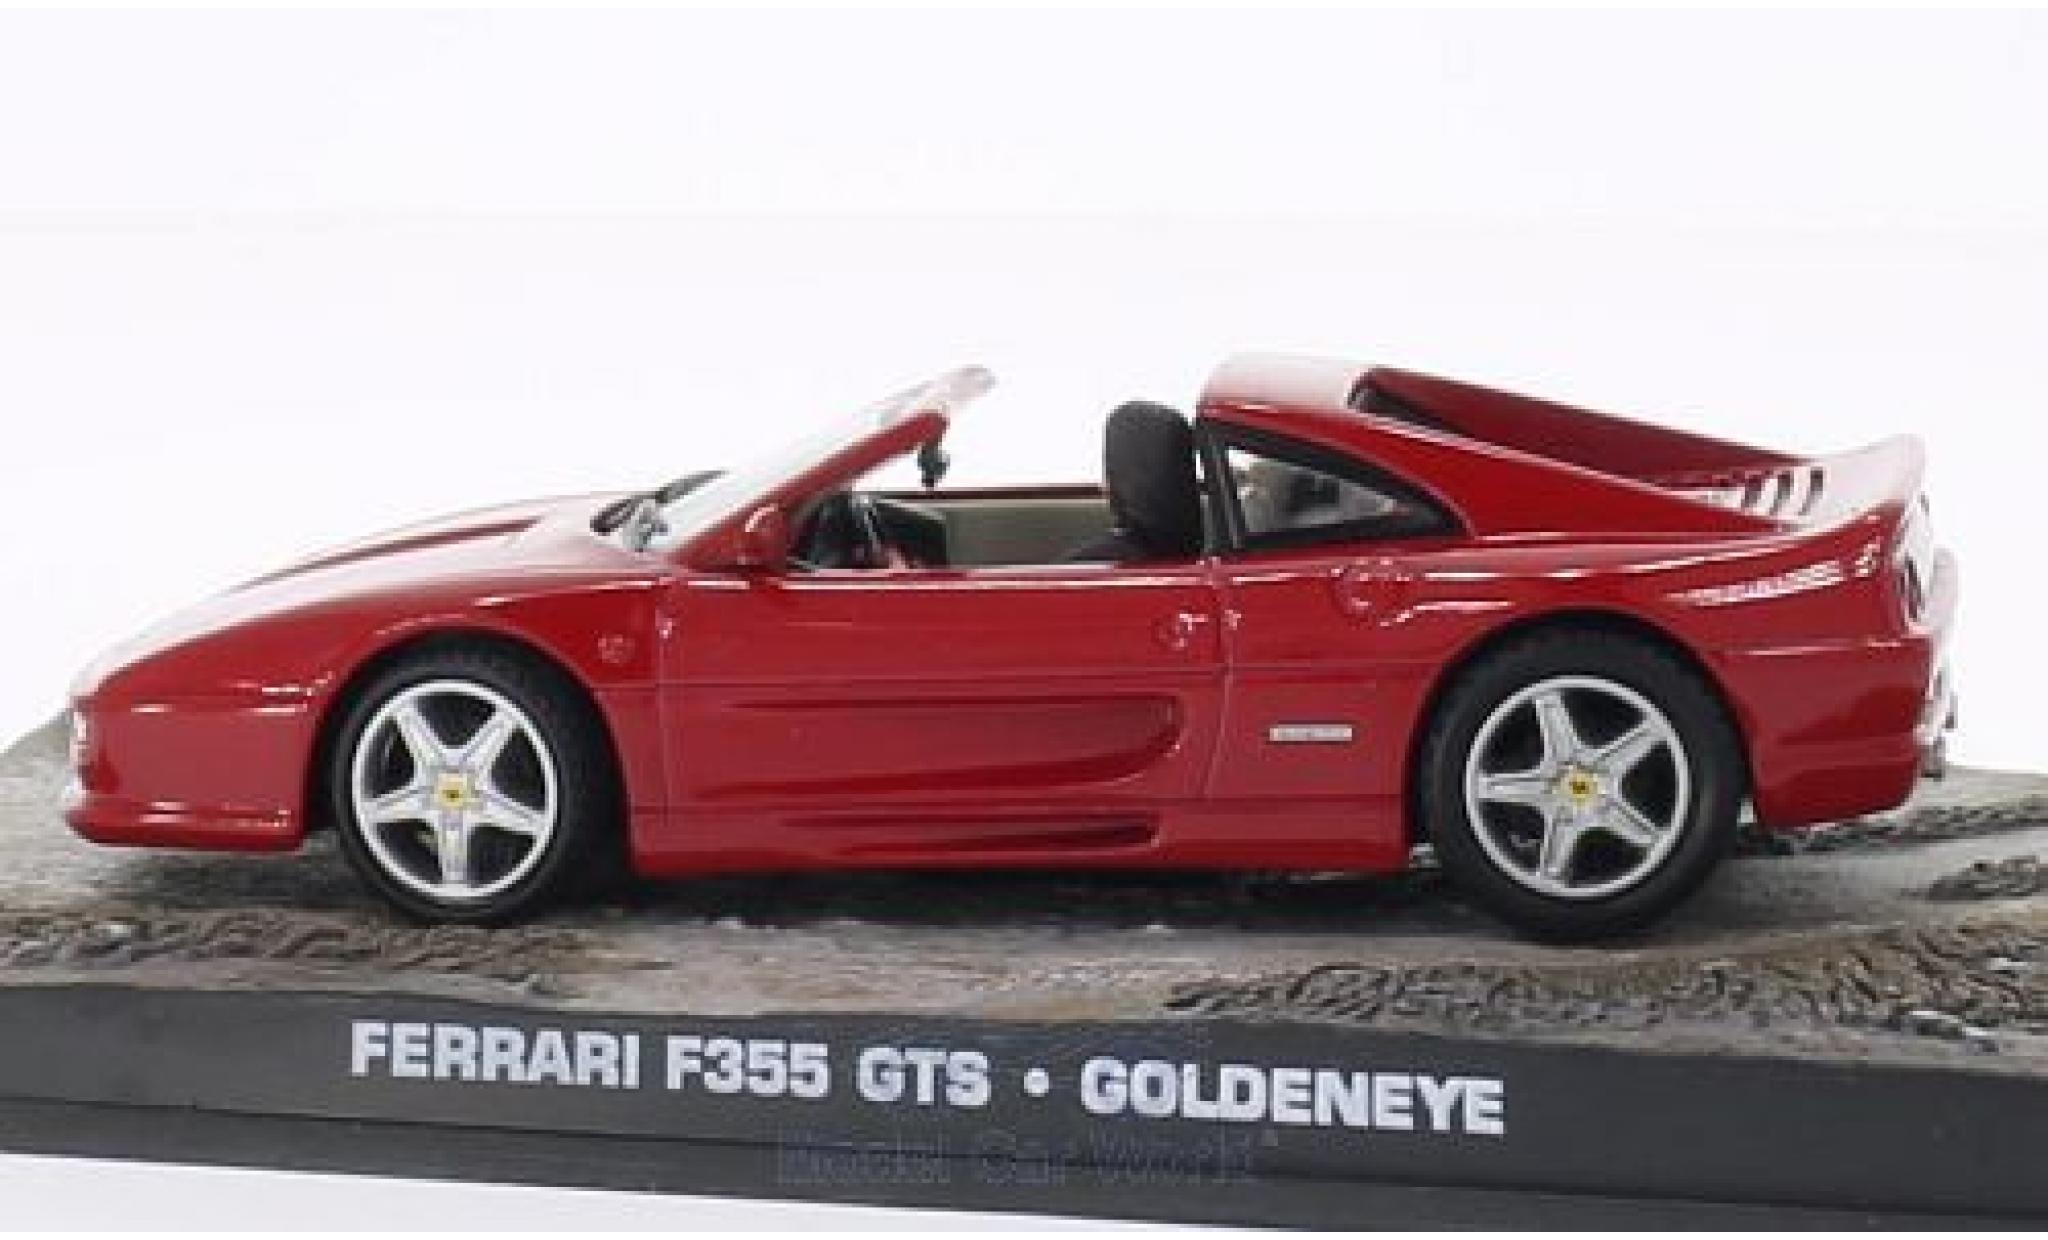 Ferrari F355 1/43 SpecialC 007 GTS rouge James Bond 007 Goldeneye ohne Vitrine